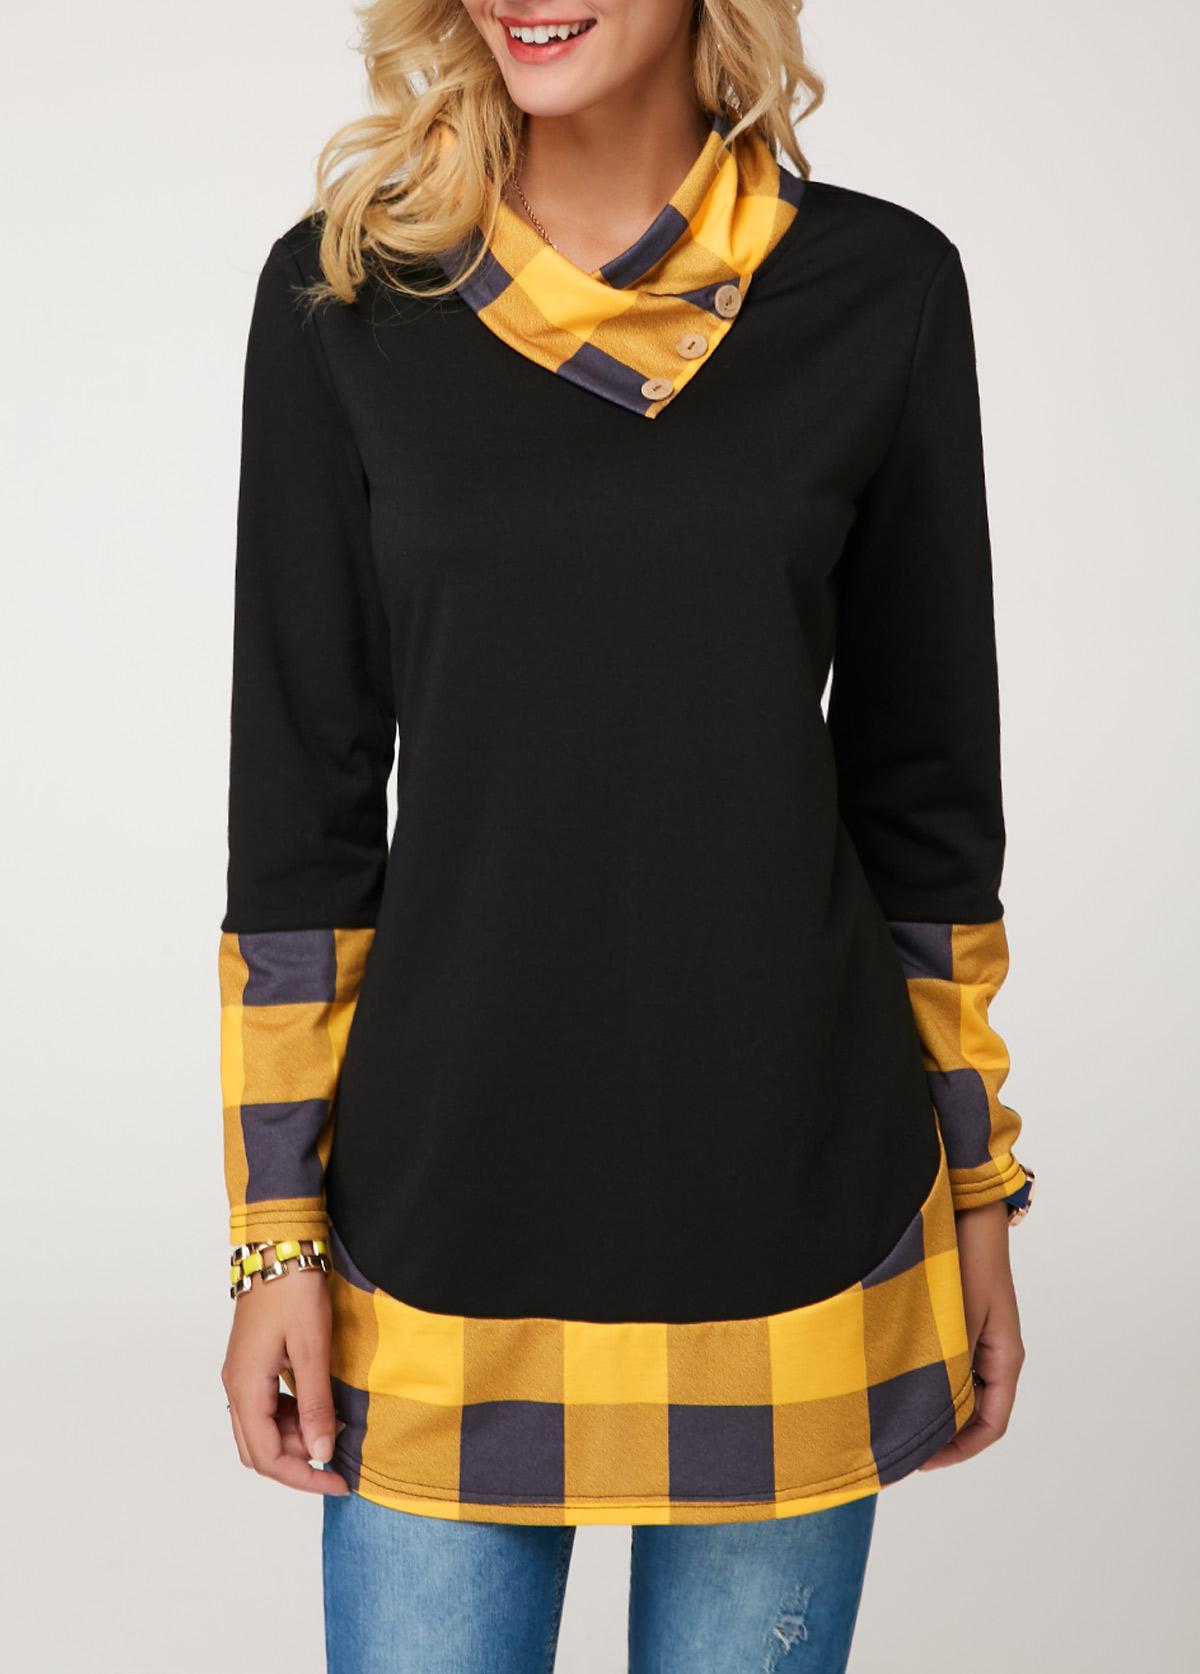 Long Sleeve Button Detail Plaid Print Tunic T Shirt